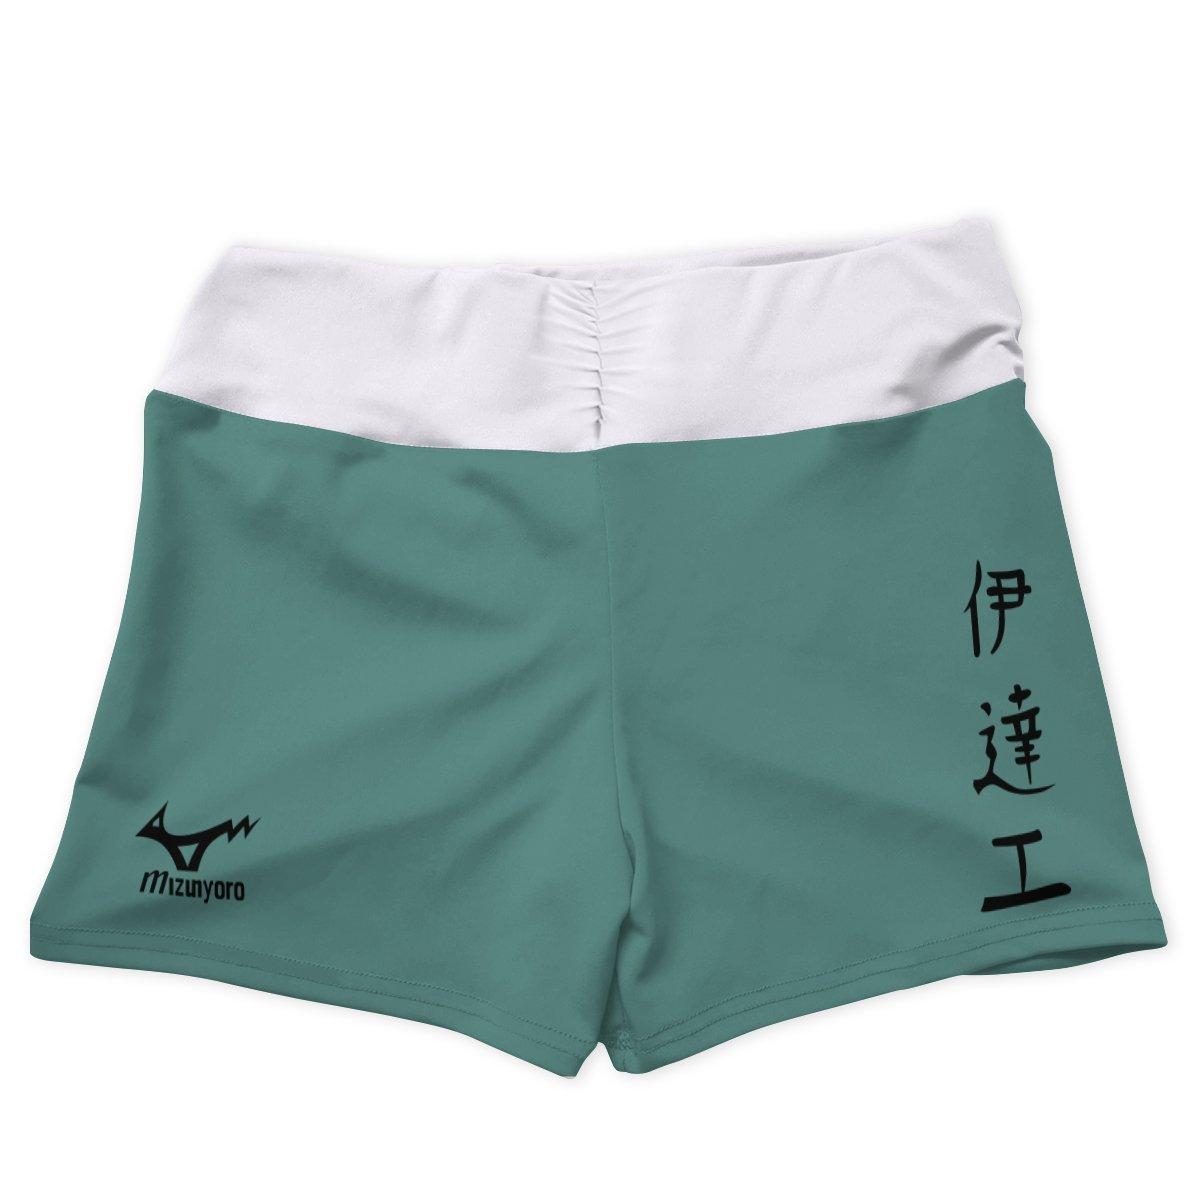 team datekou active wear set 848652 - Anime Swimsuits